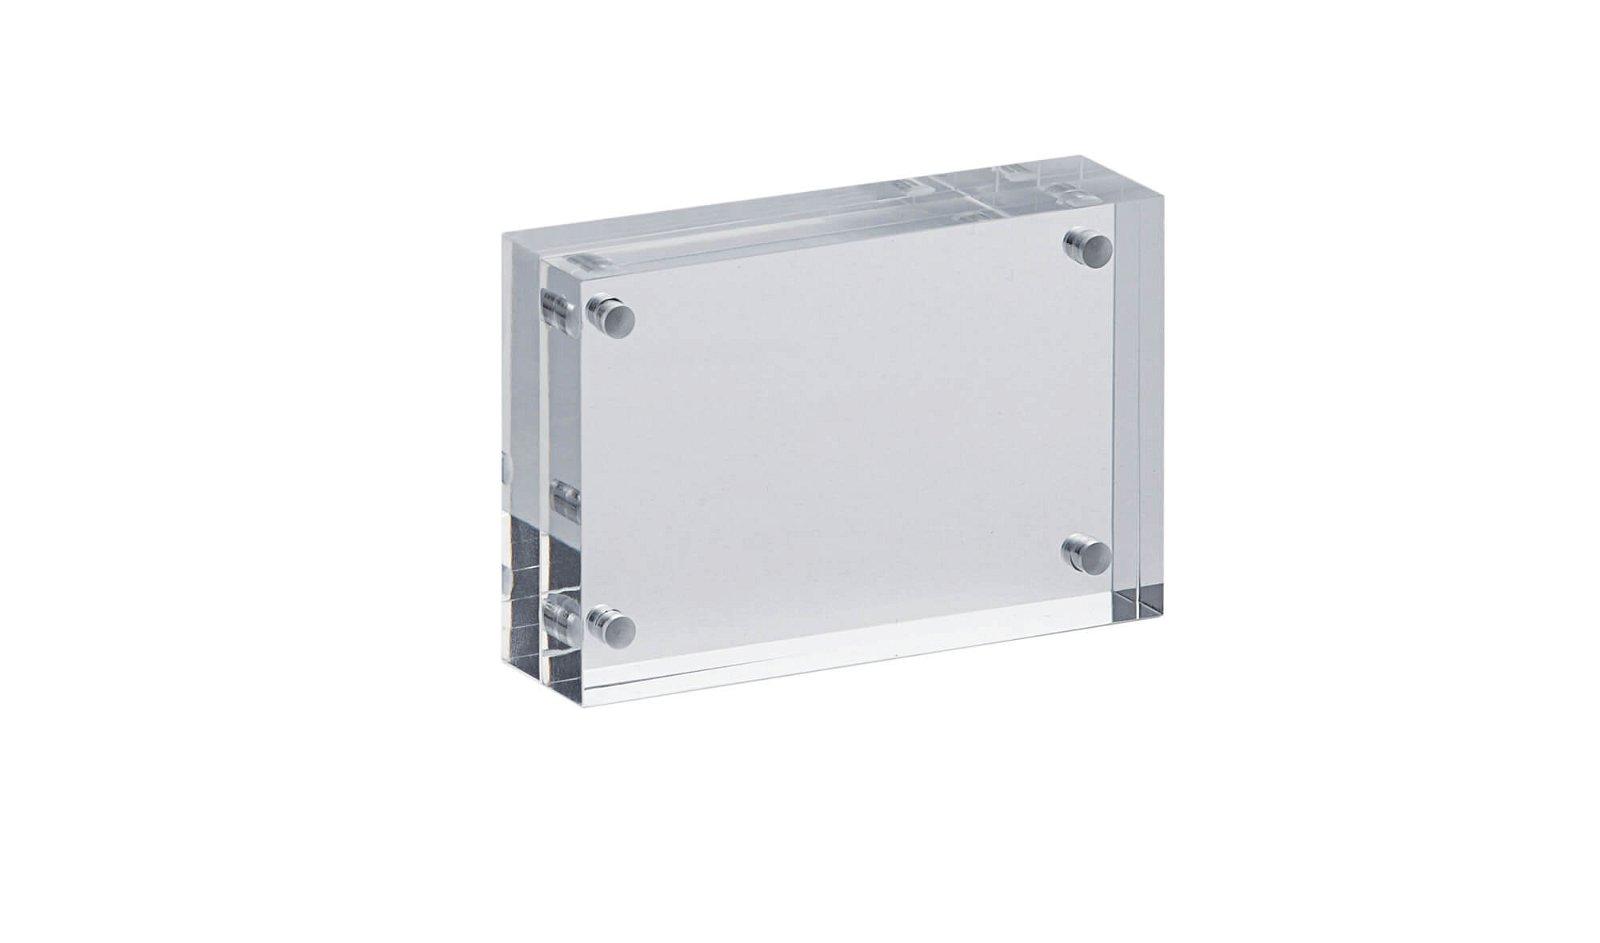 Acryl-Bilderhalter, 7,5 x 5 x 2 cm, glasklar